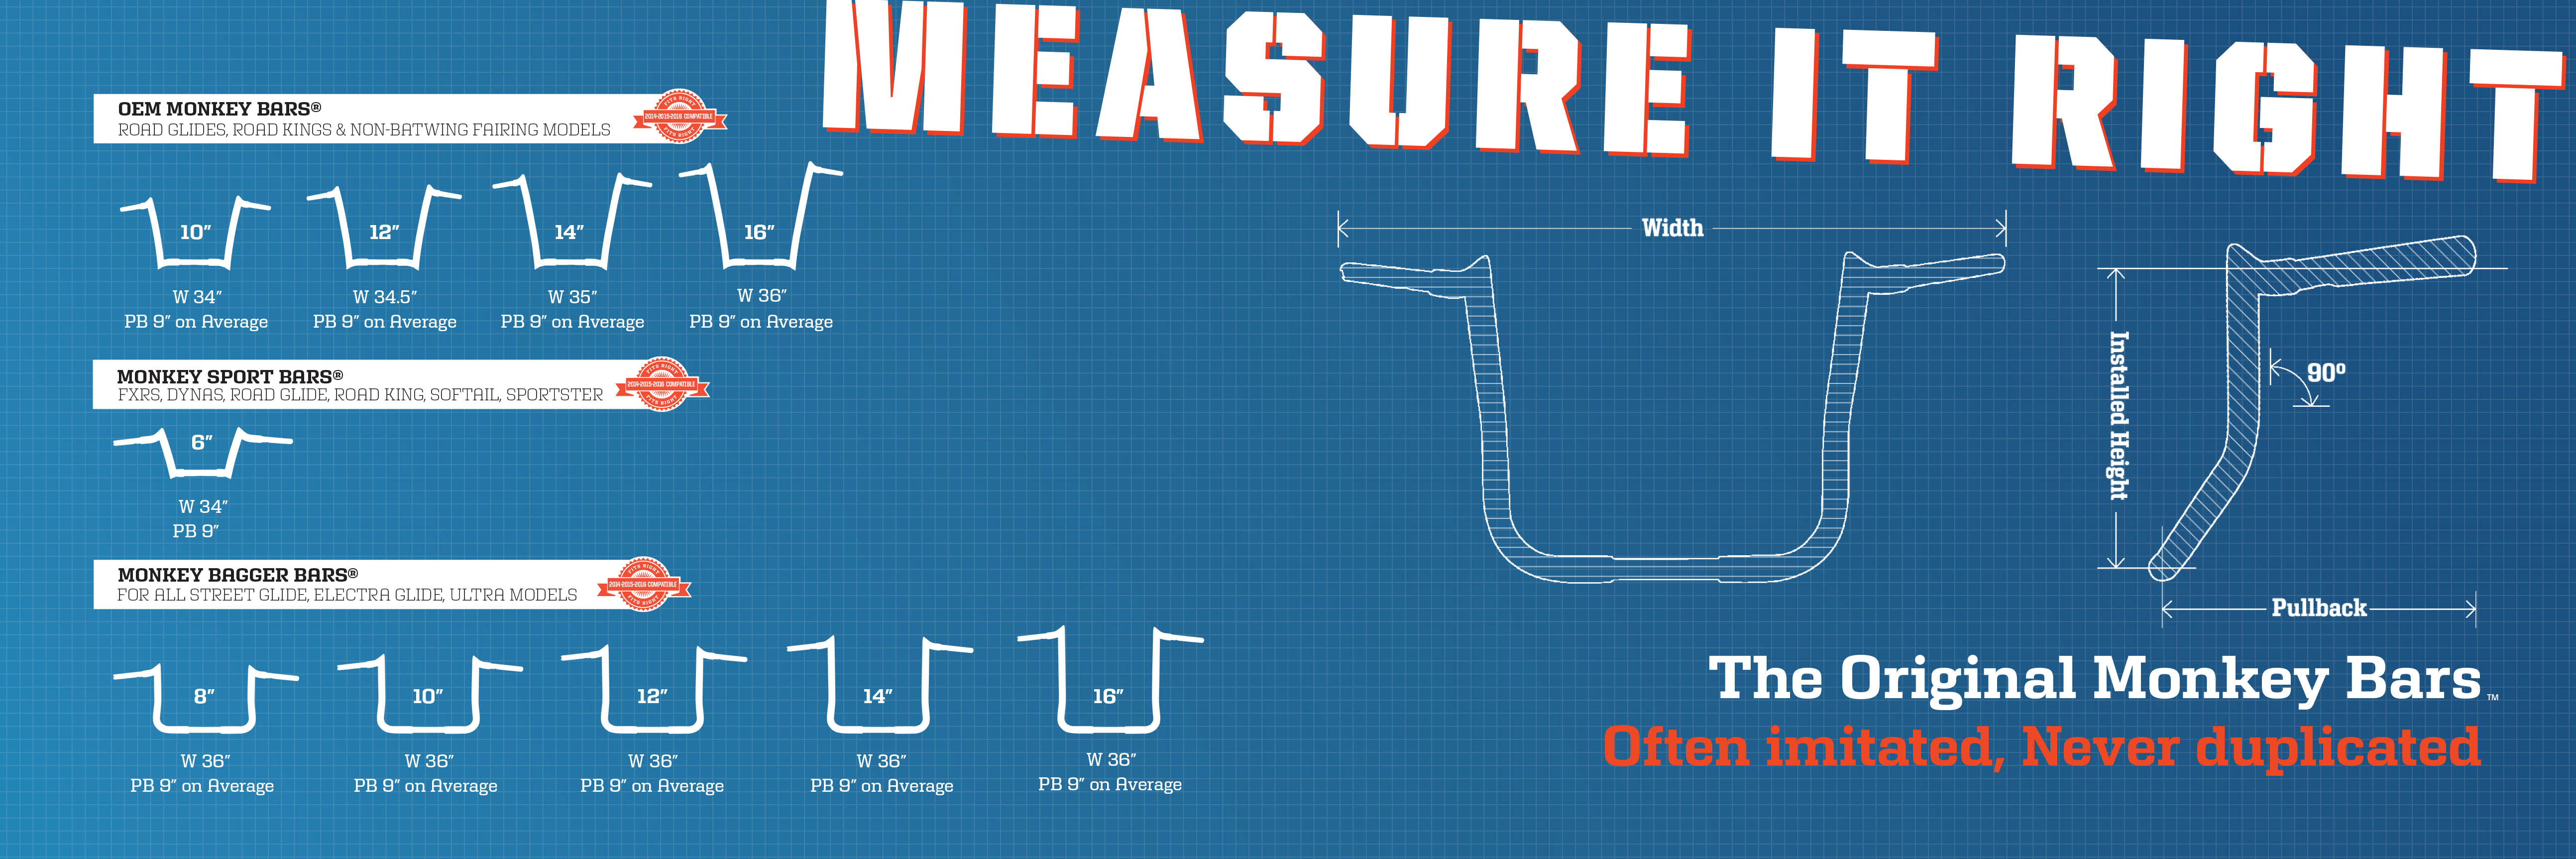 Measure It Right